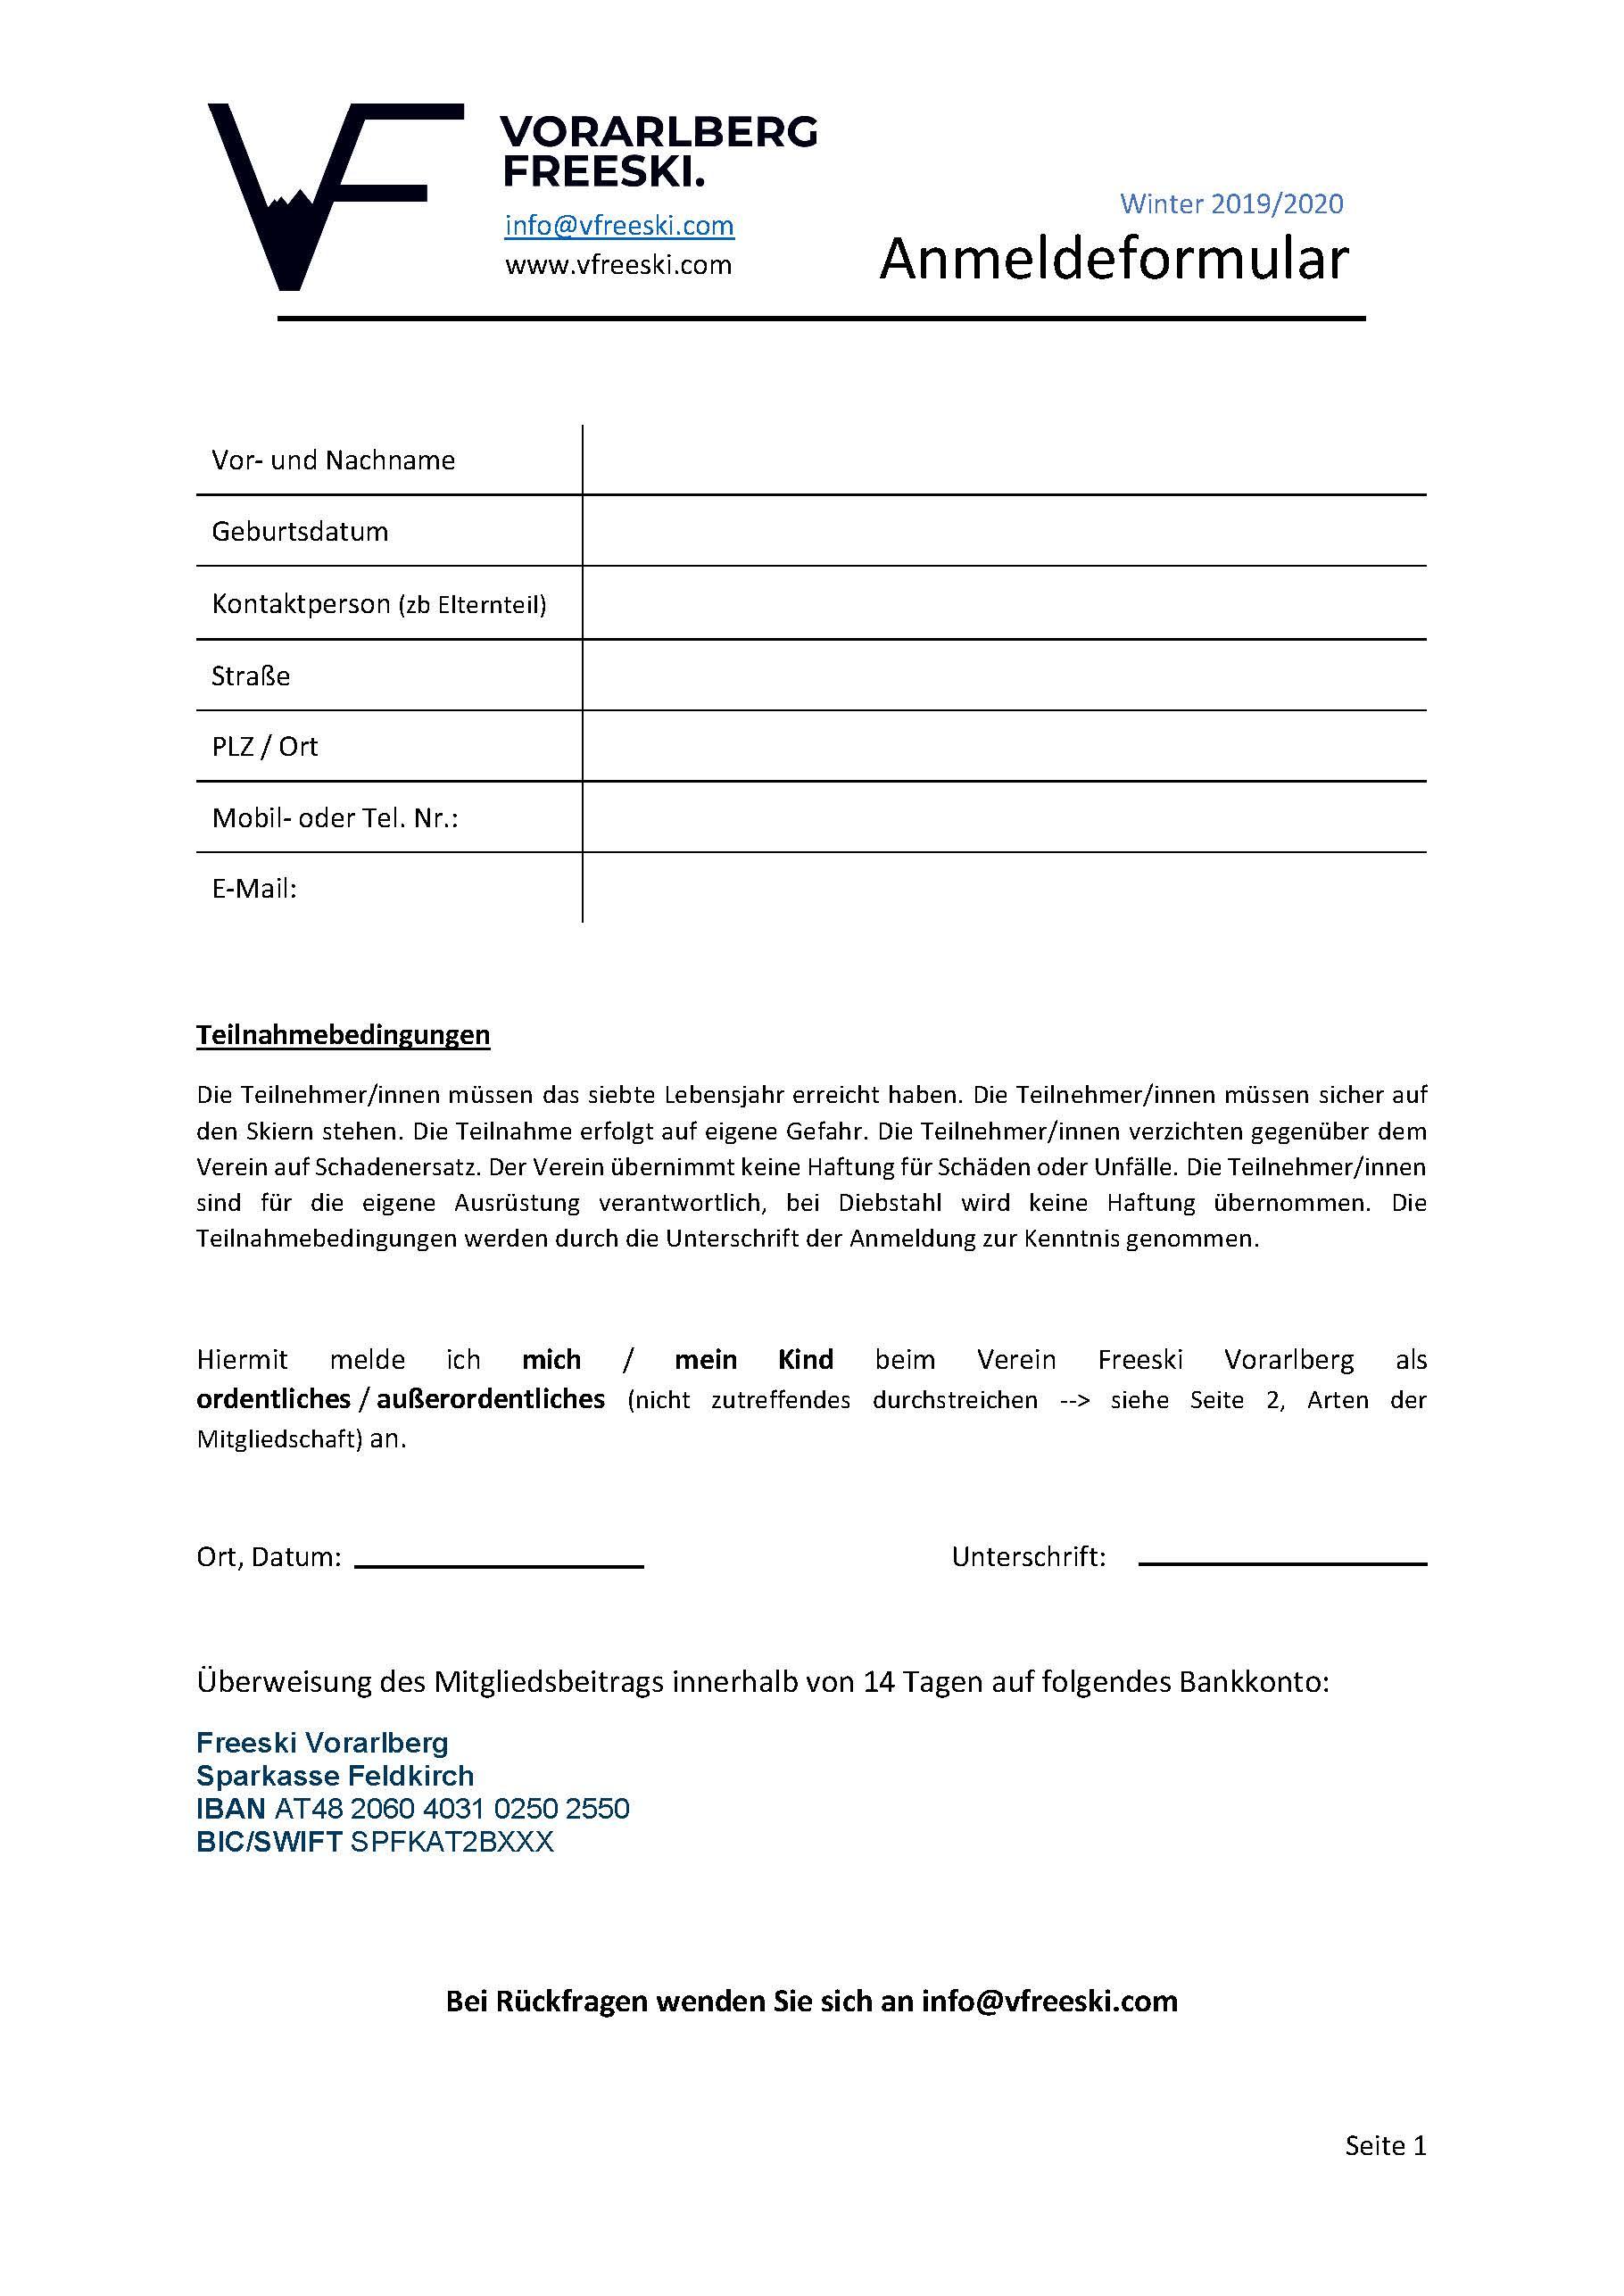 Anmeldeformular Vorarlberg Freeski -2